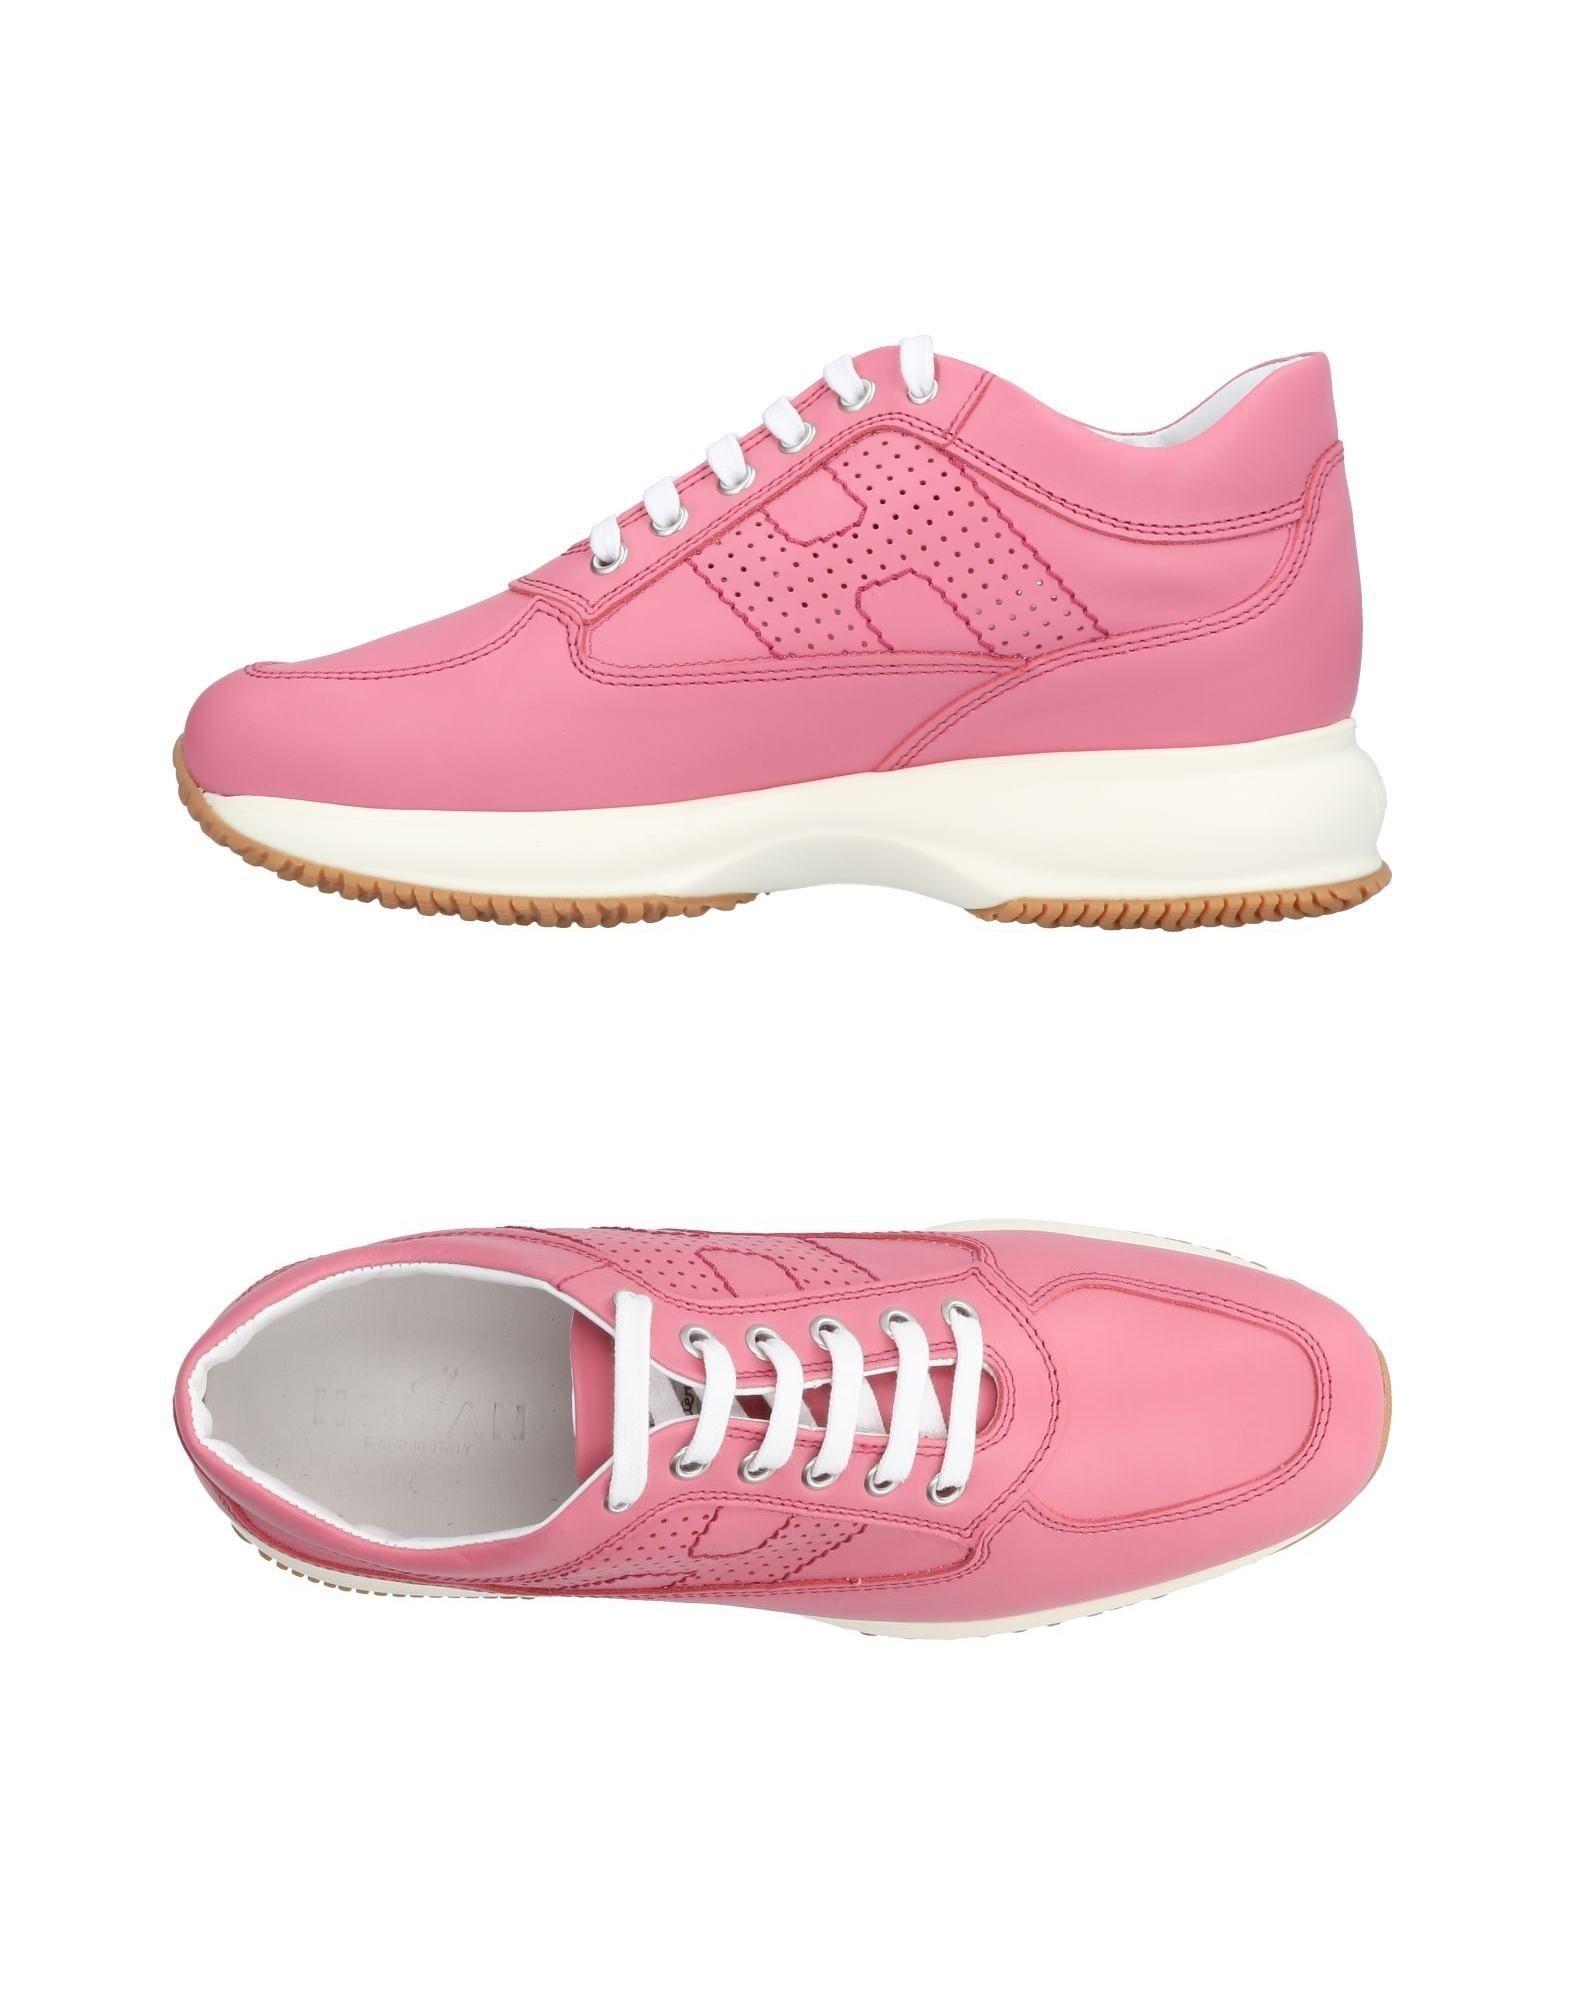 Hogan Sneakers Damen  11412688JRGut aussehende strapazierfähige Schuhe